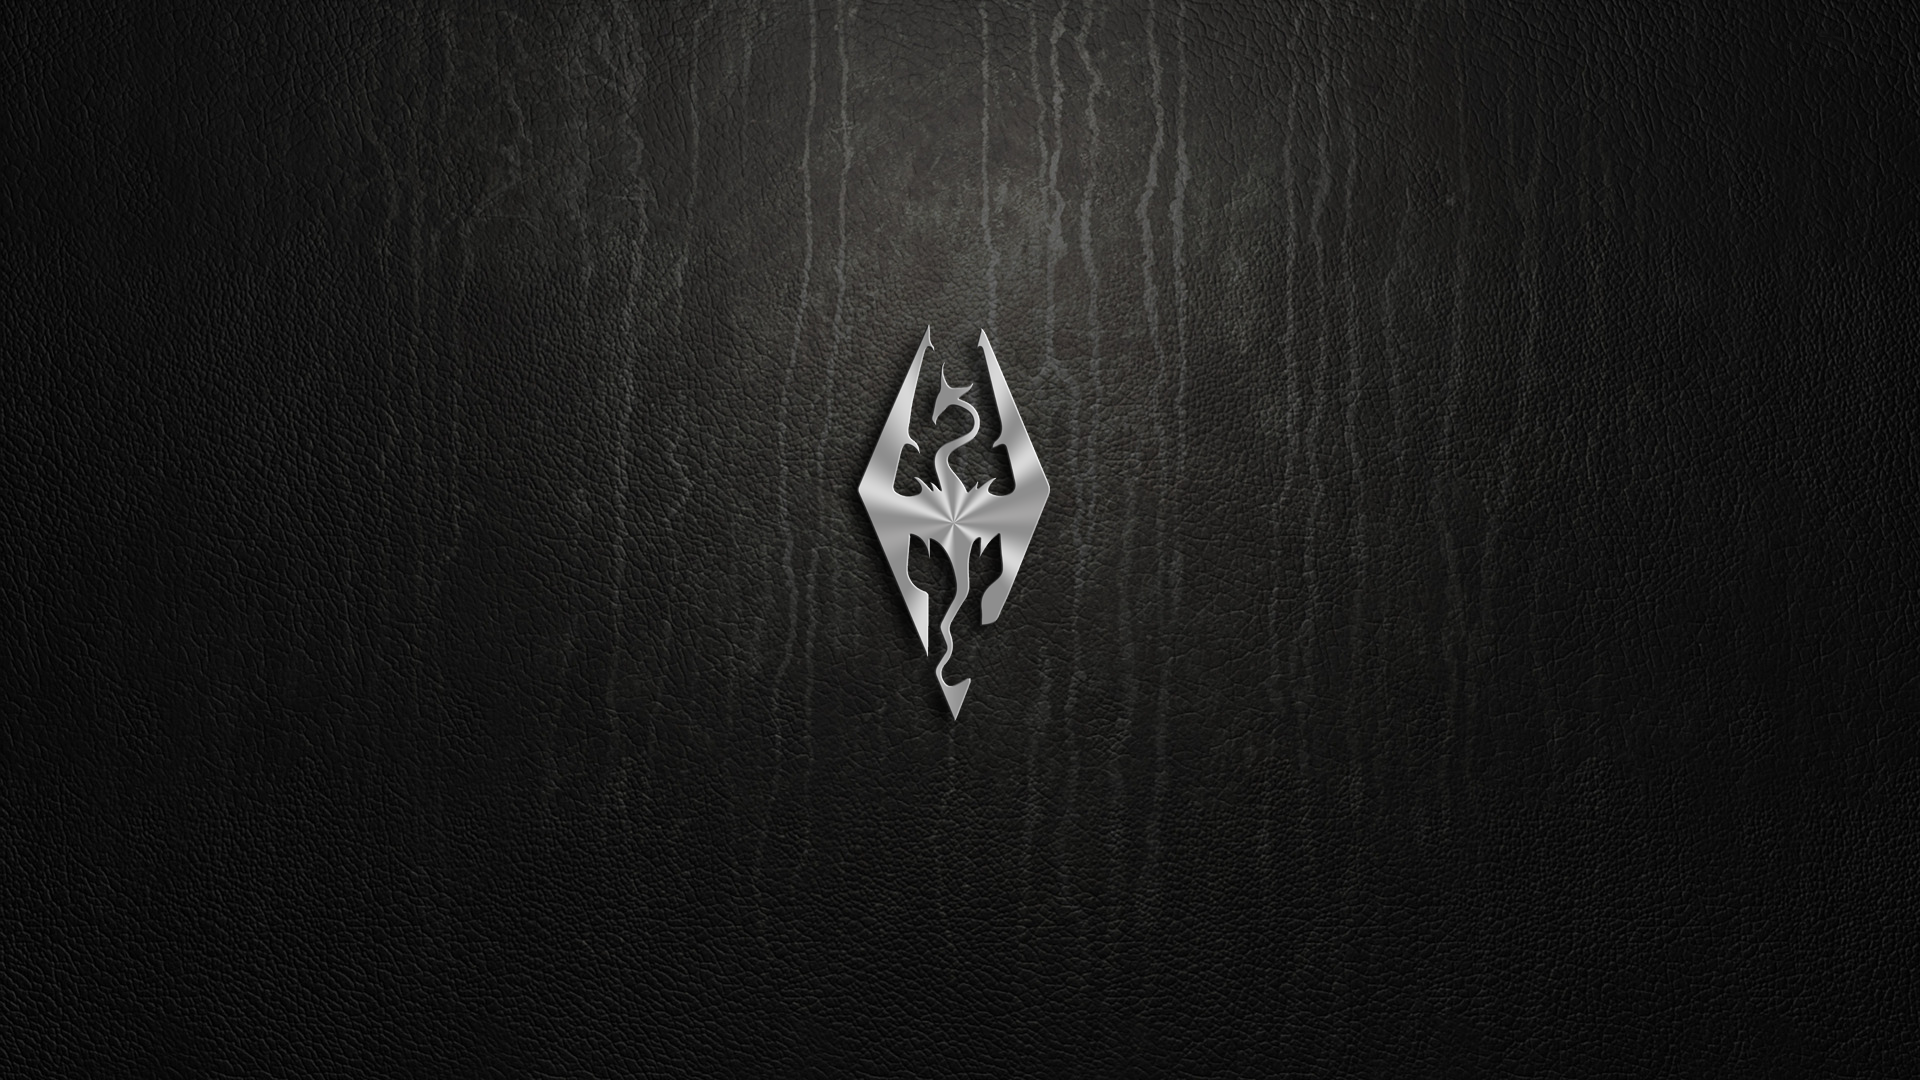 Skyrim Logo Hd Wallpapers